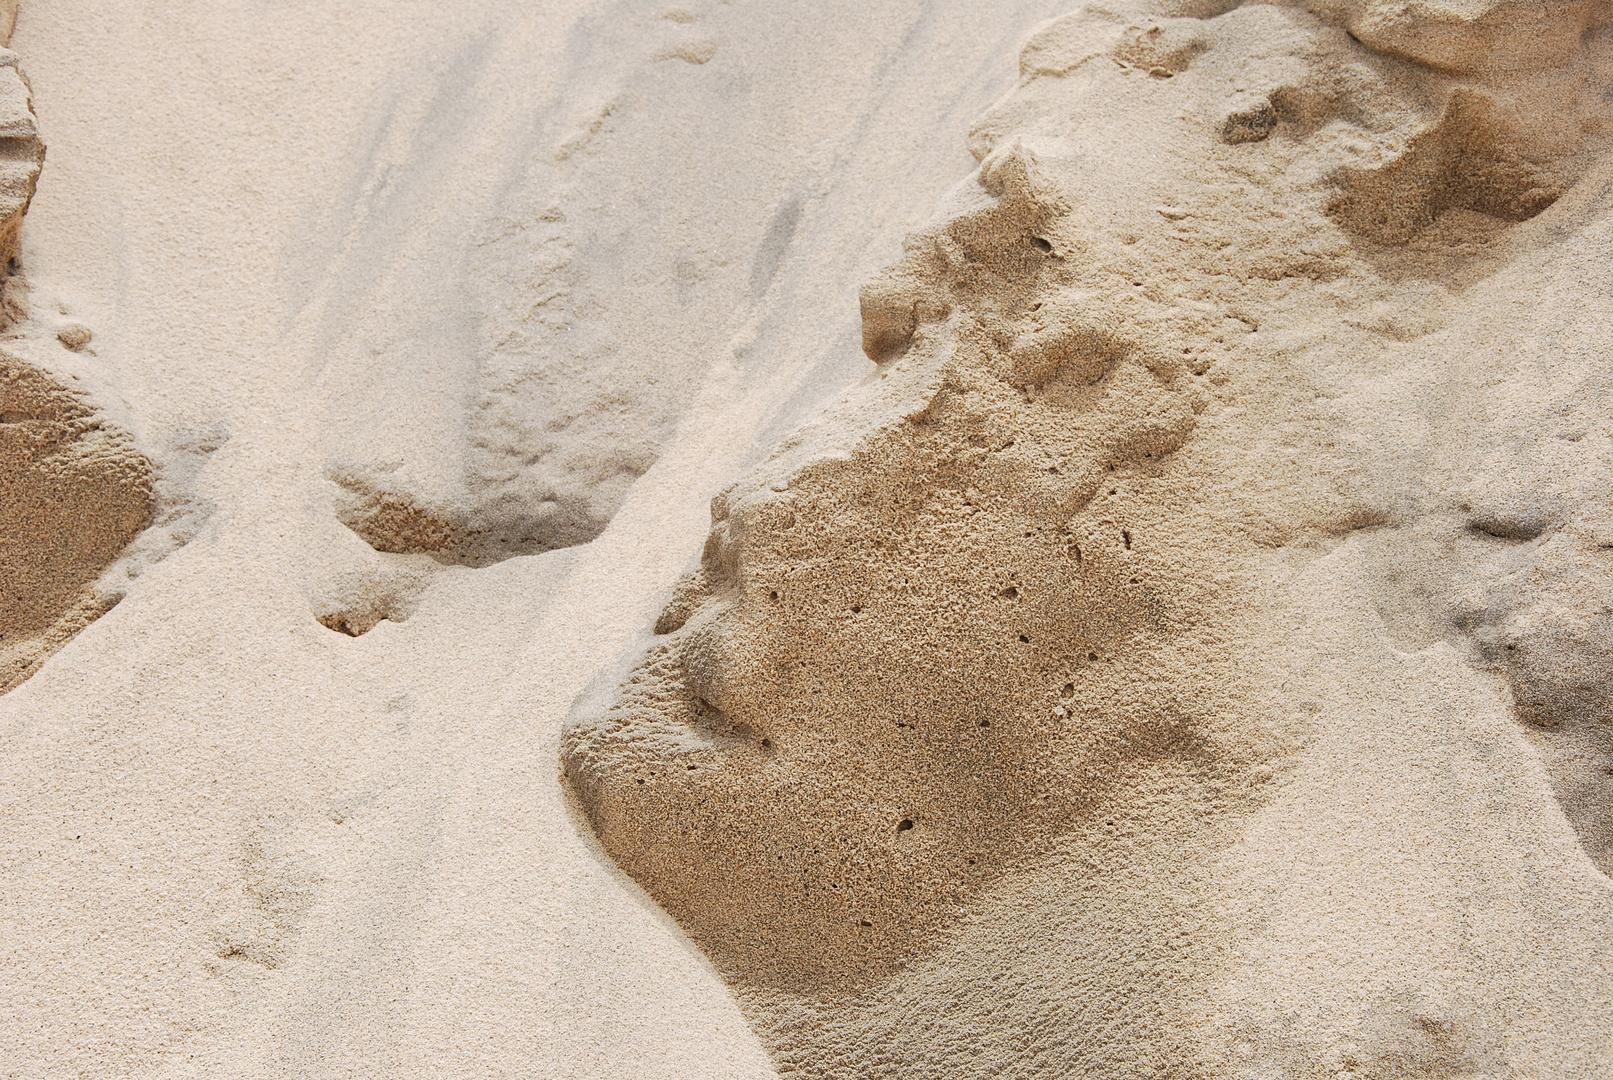 Vom Wind geformter Sand 1, Cabo Verde